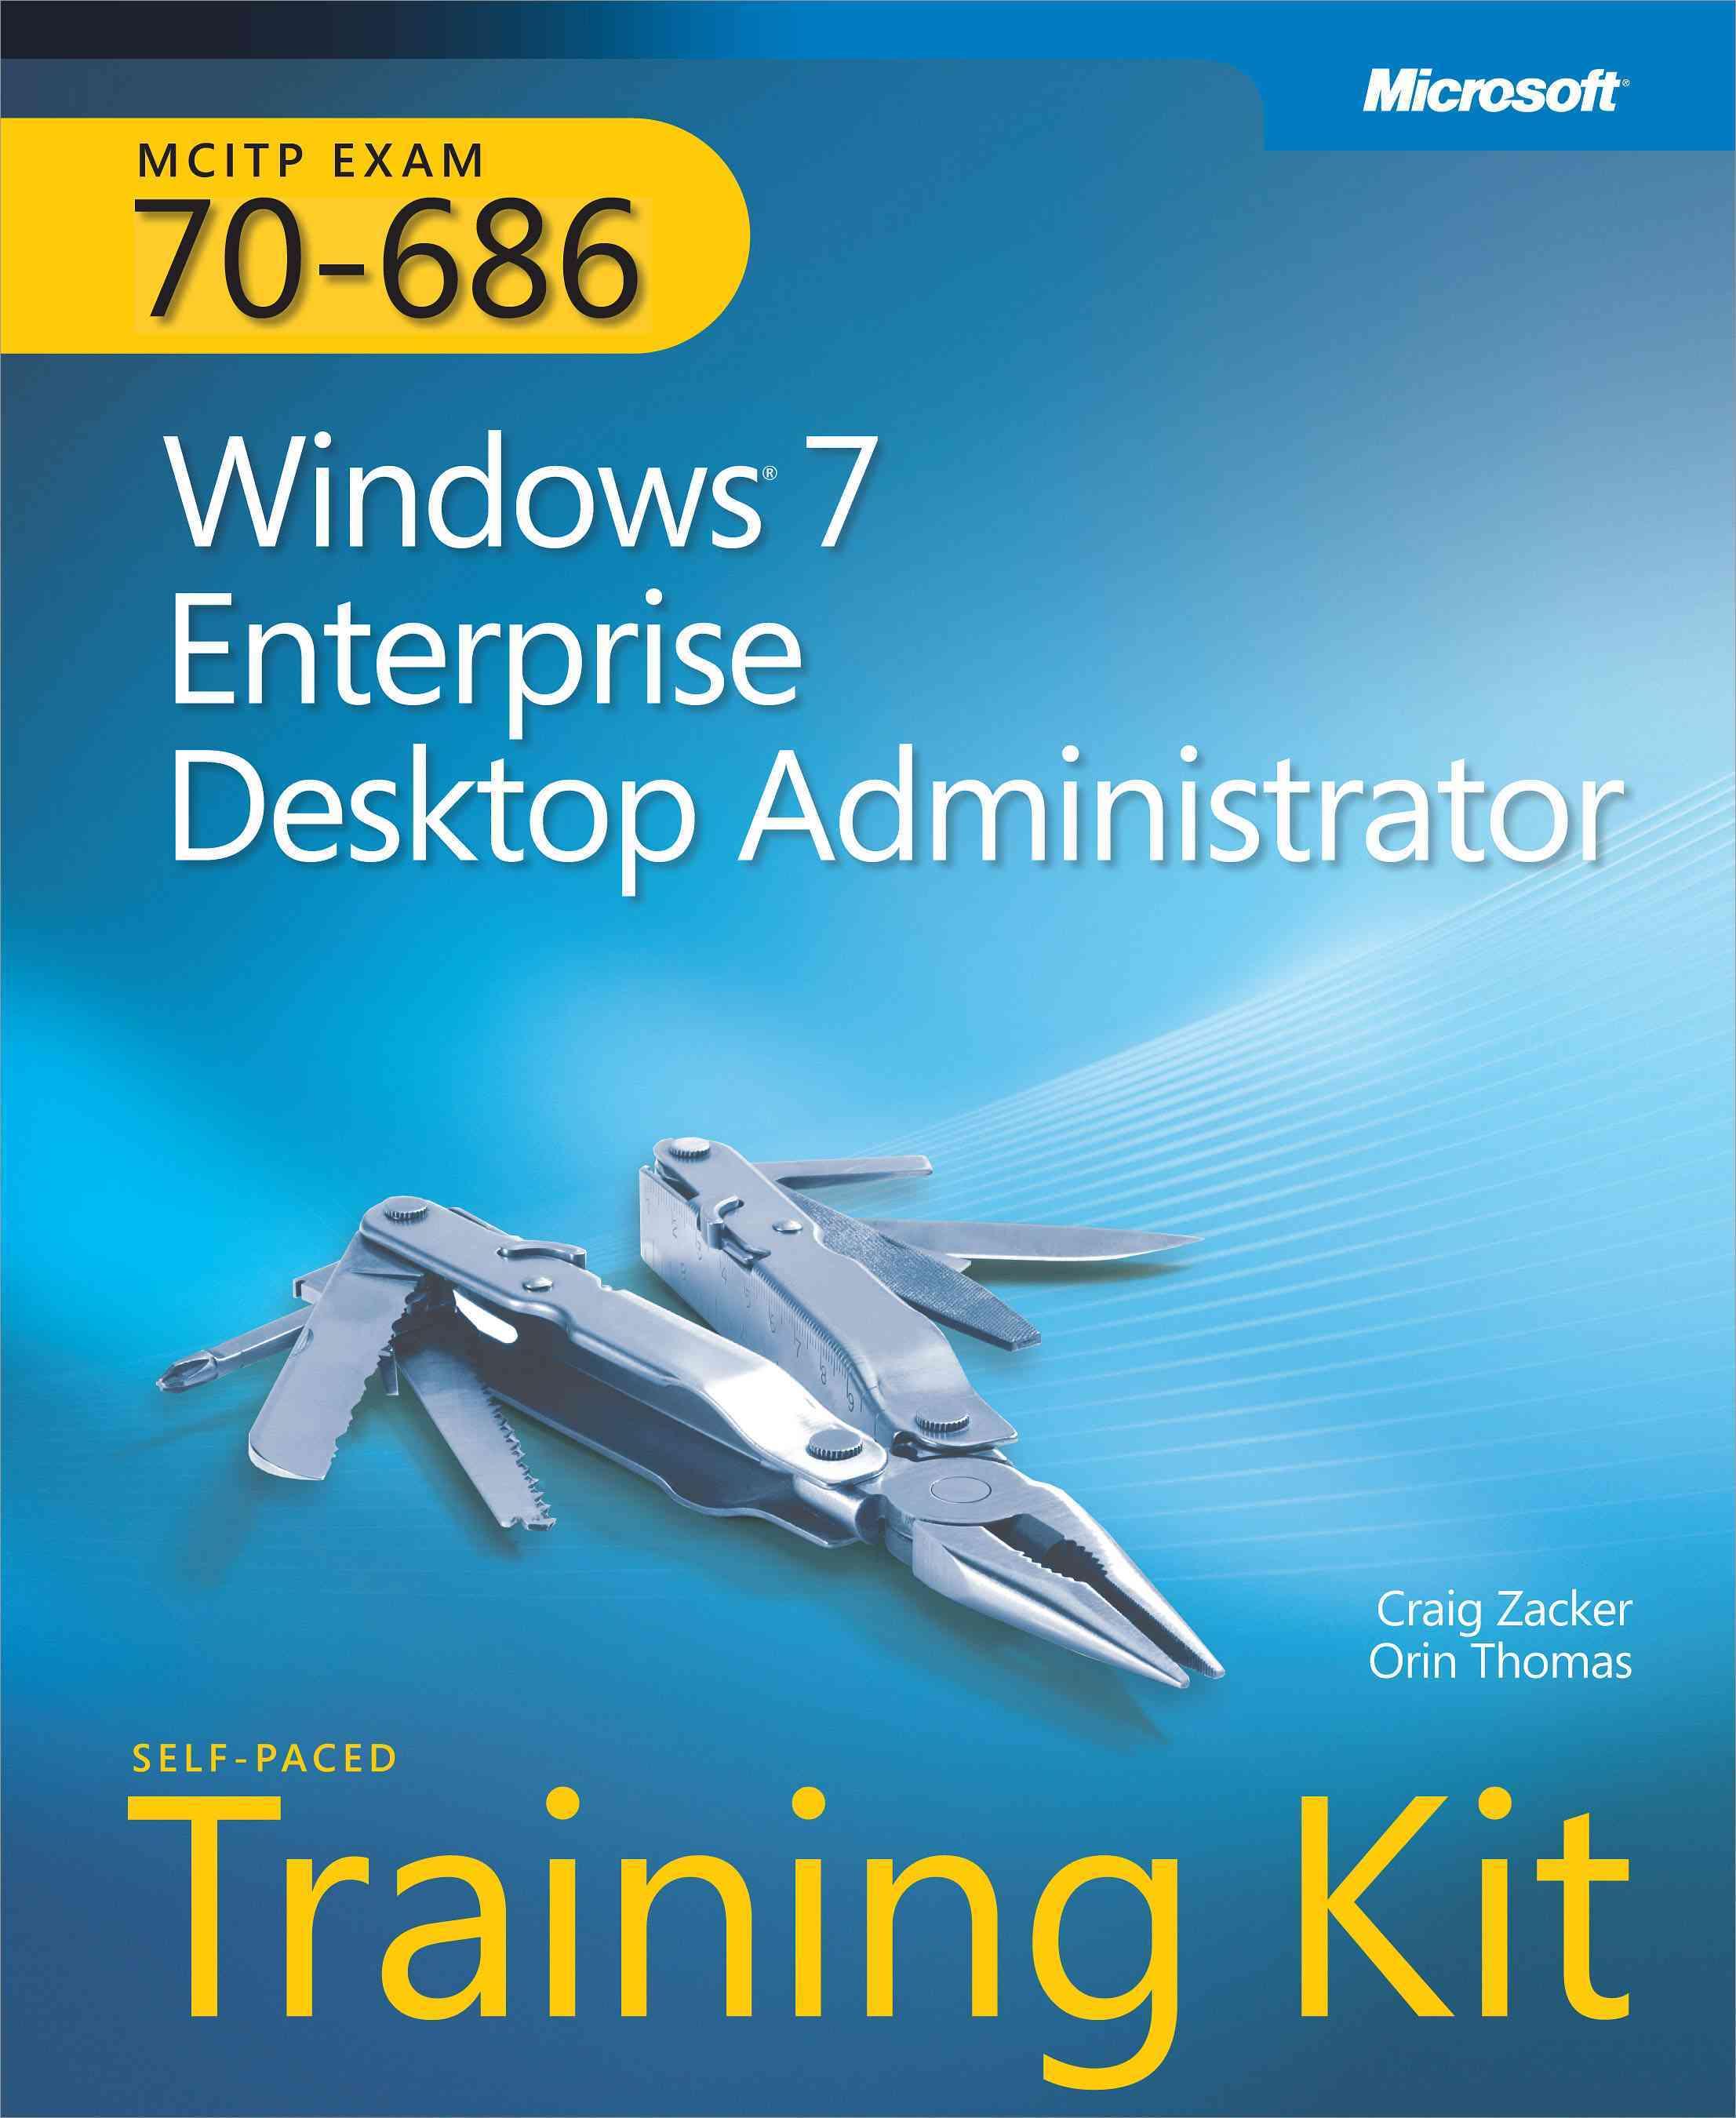 Mcitp Self-paced Training Kit (Exam 70-686): Windows 7 Desktop Administrator